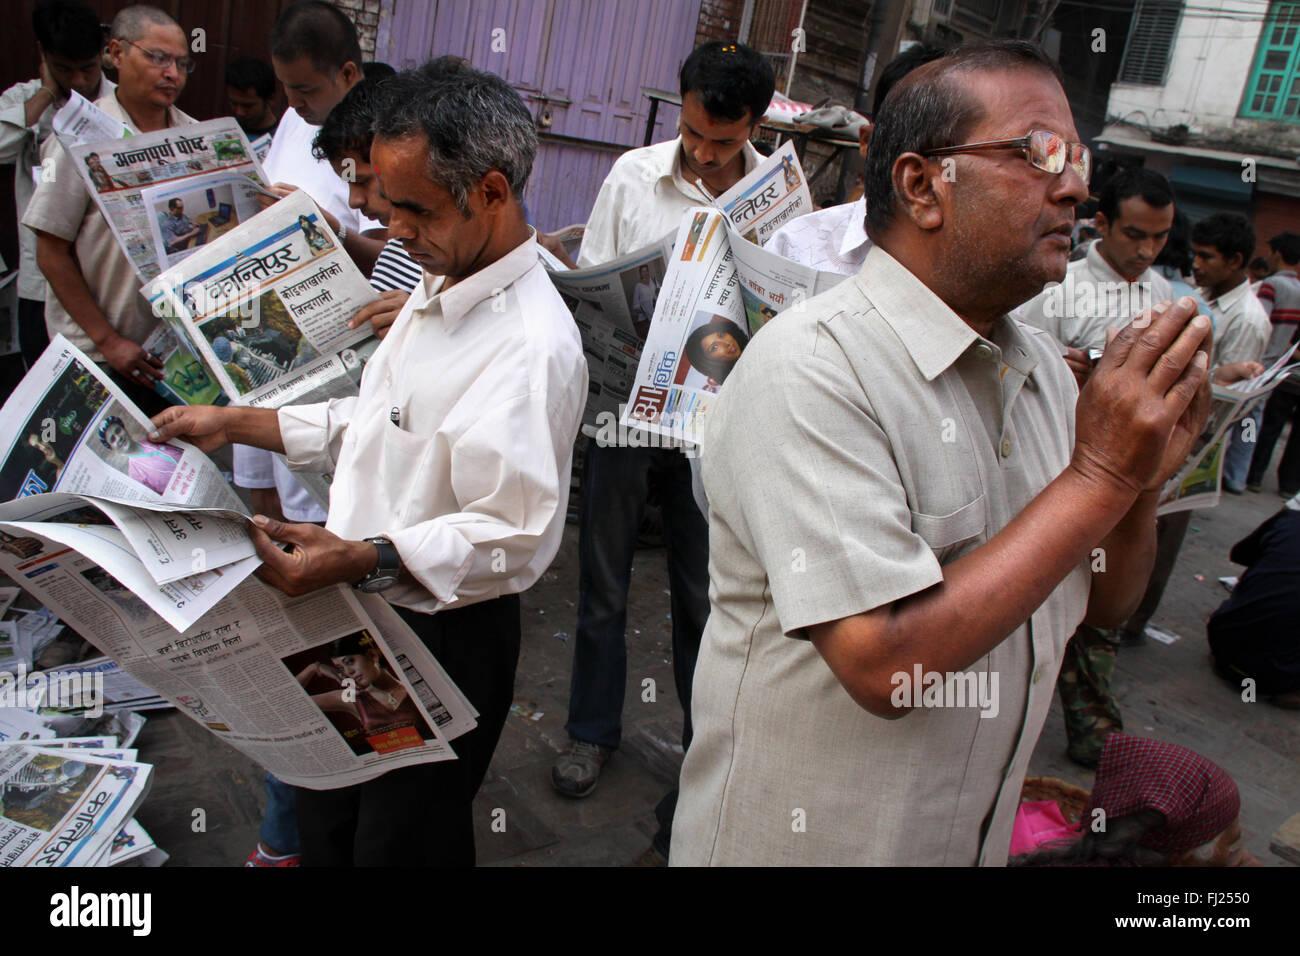 People reading newspapers in the streets of Katmandu, Nepal - Stock Image